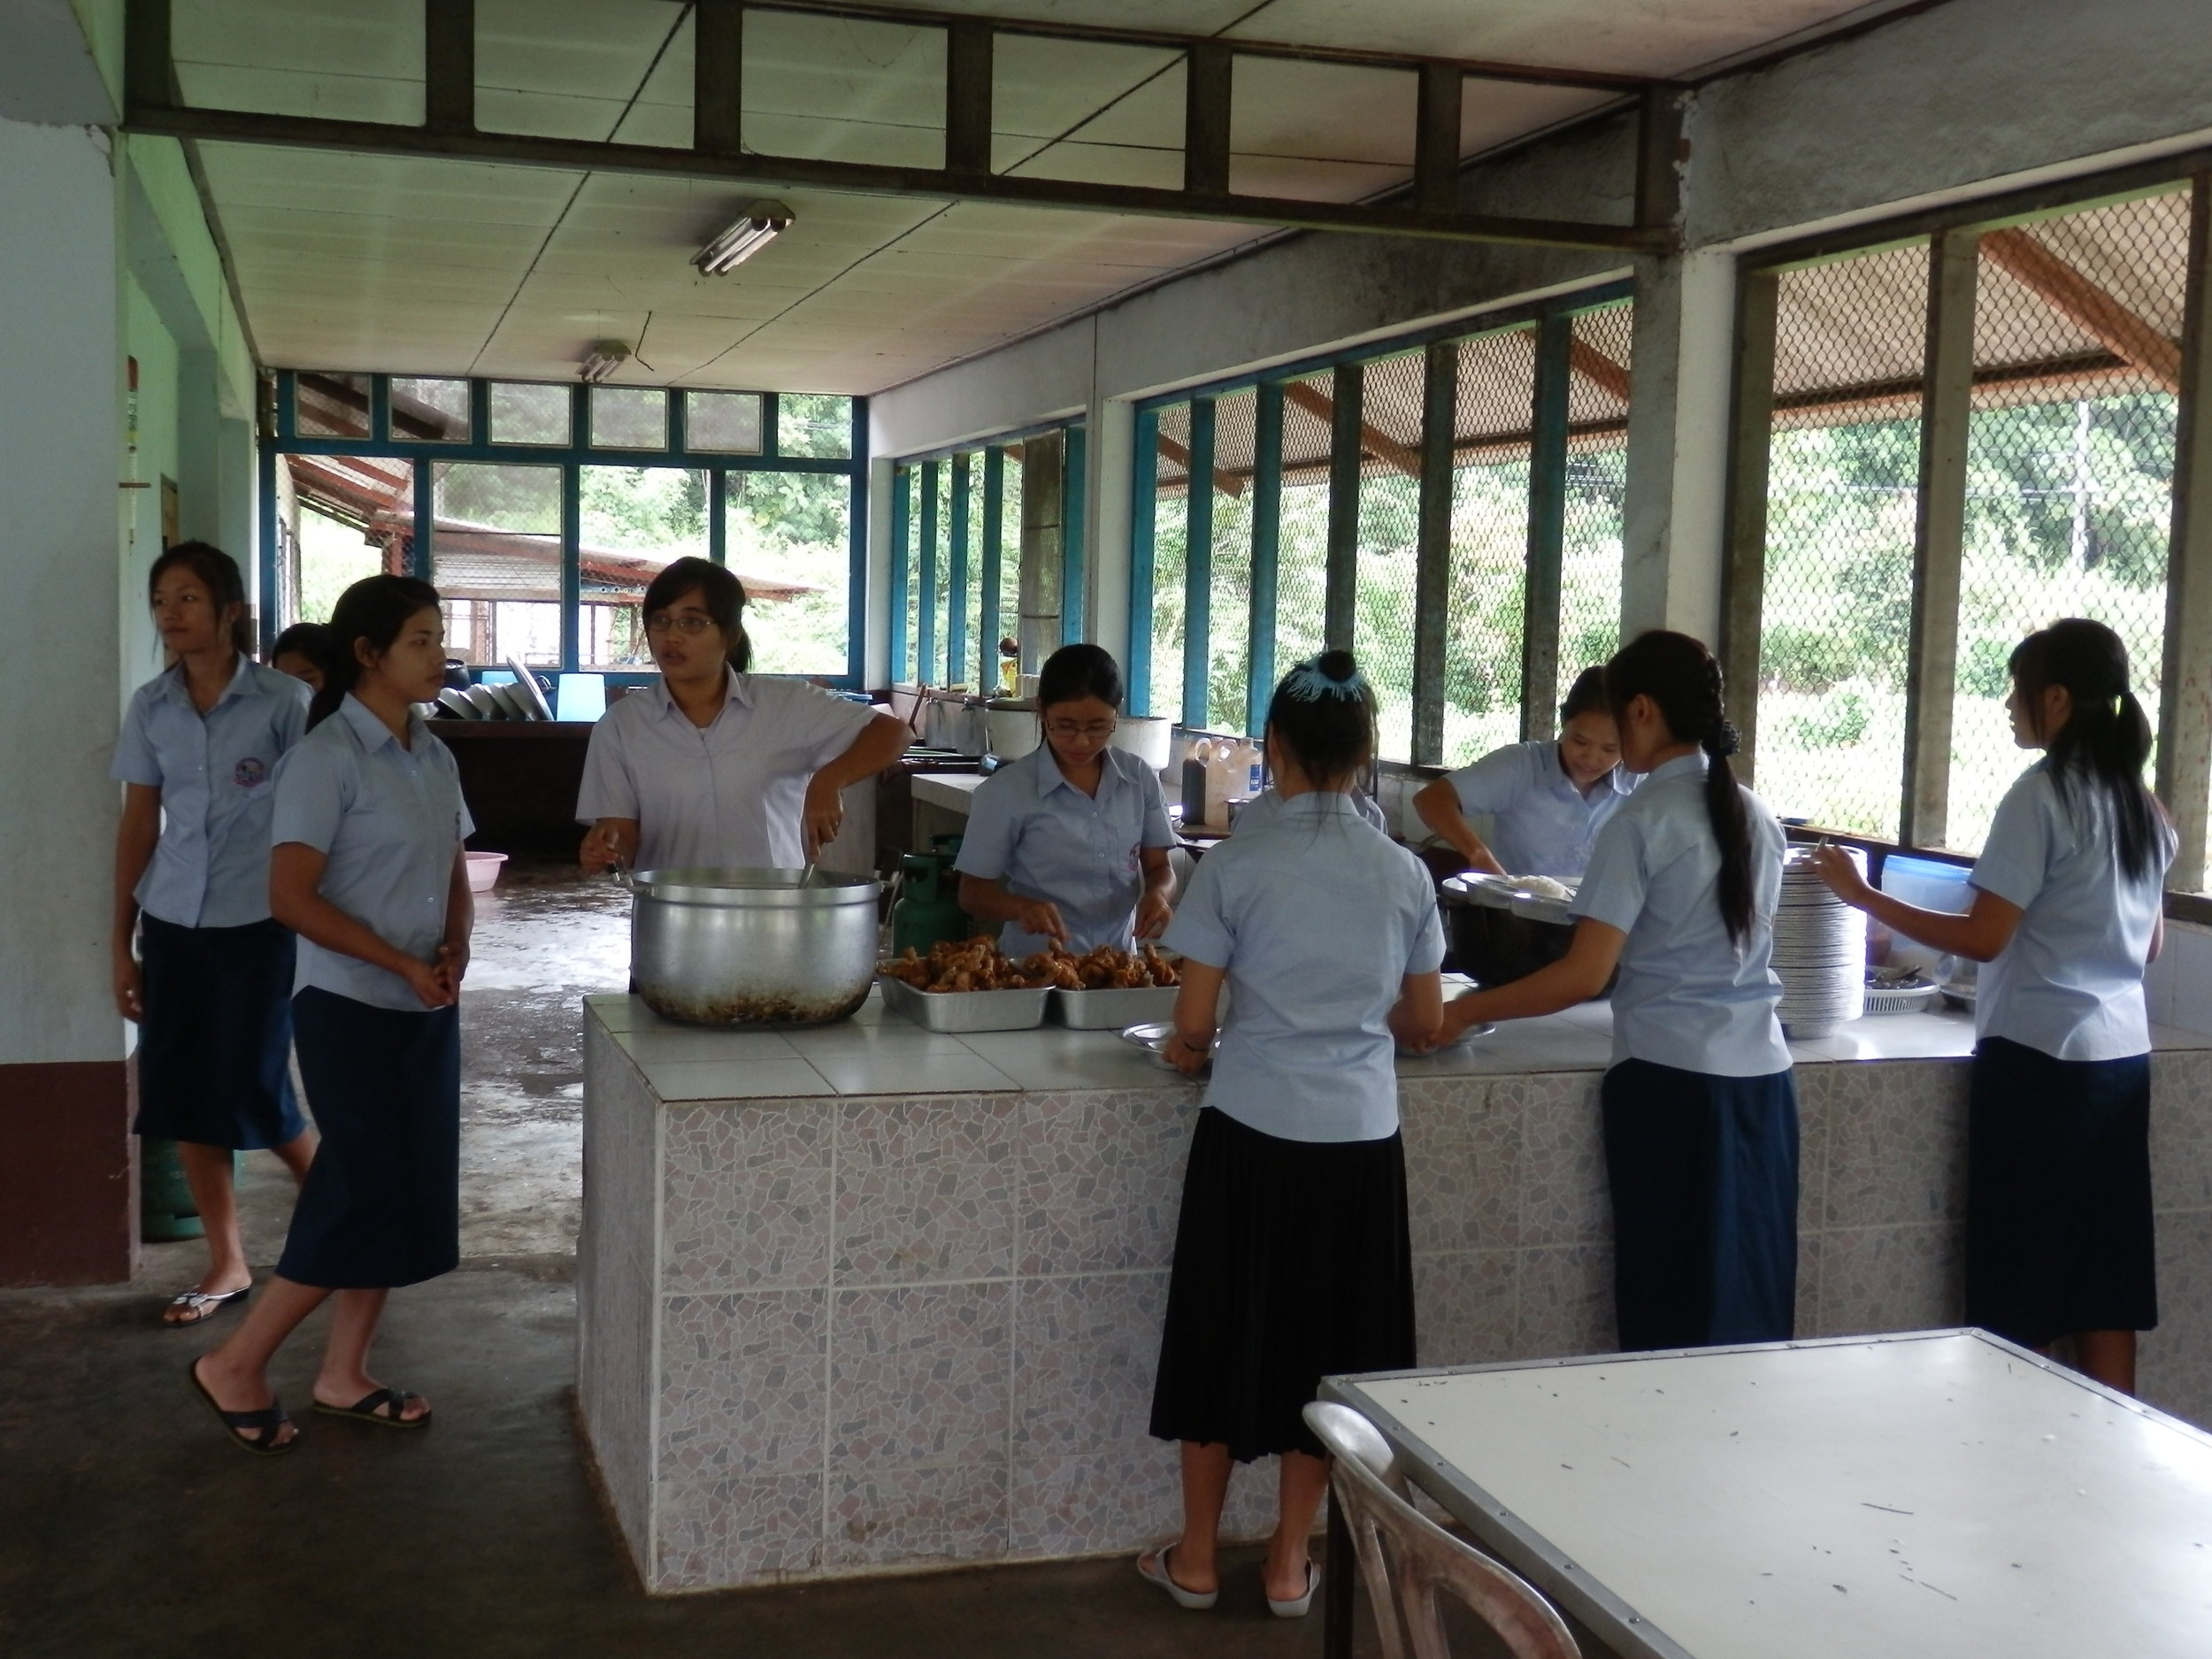 LBI cafeteria.JPG